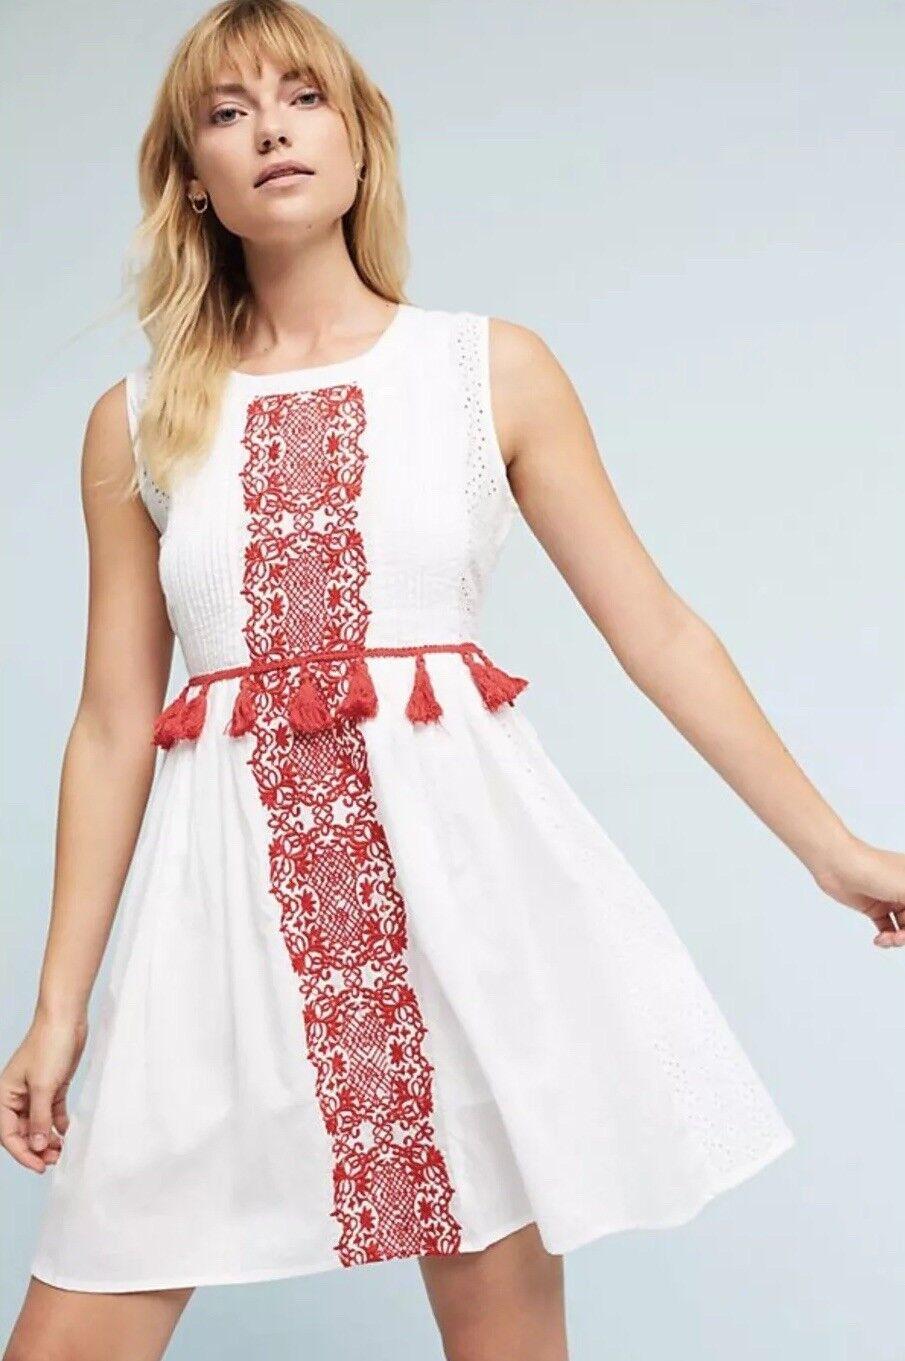 NEW Anthropologie Chantik Margaret Dress Größe Small Tassel rot Embroiderot Pom